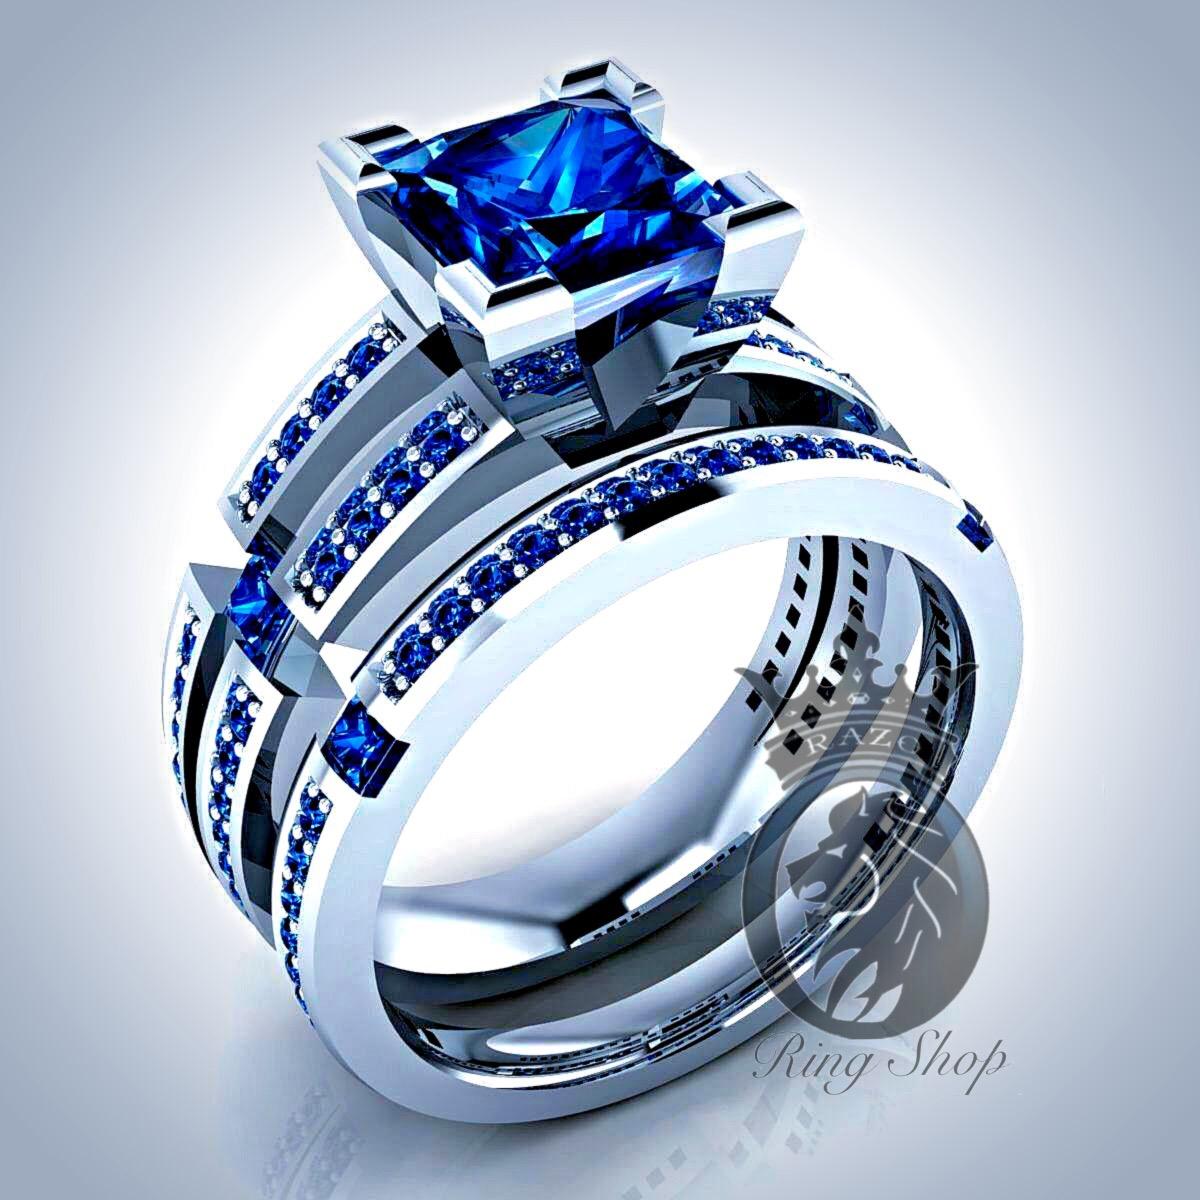 r2-d2-engagement-ring_geek-gadgets